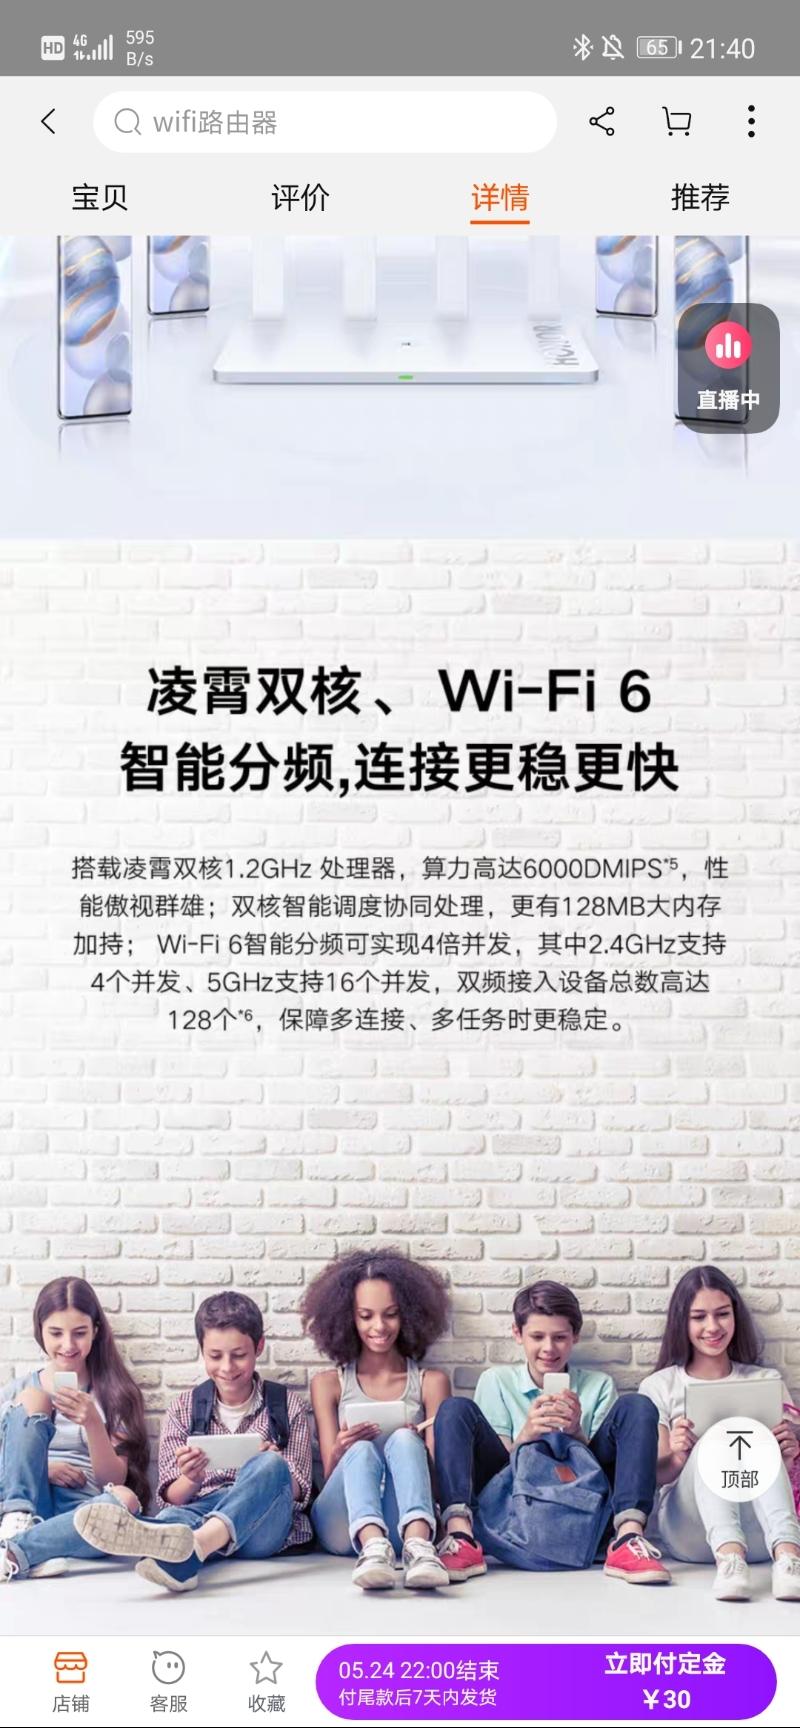 Screenshot_20200518_214009_com.taobao.taobao.jpg